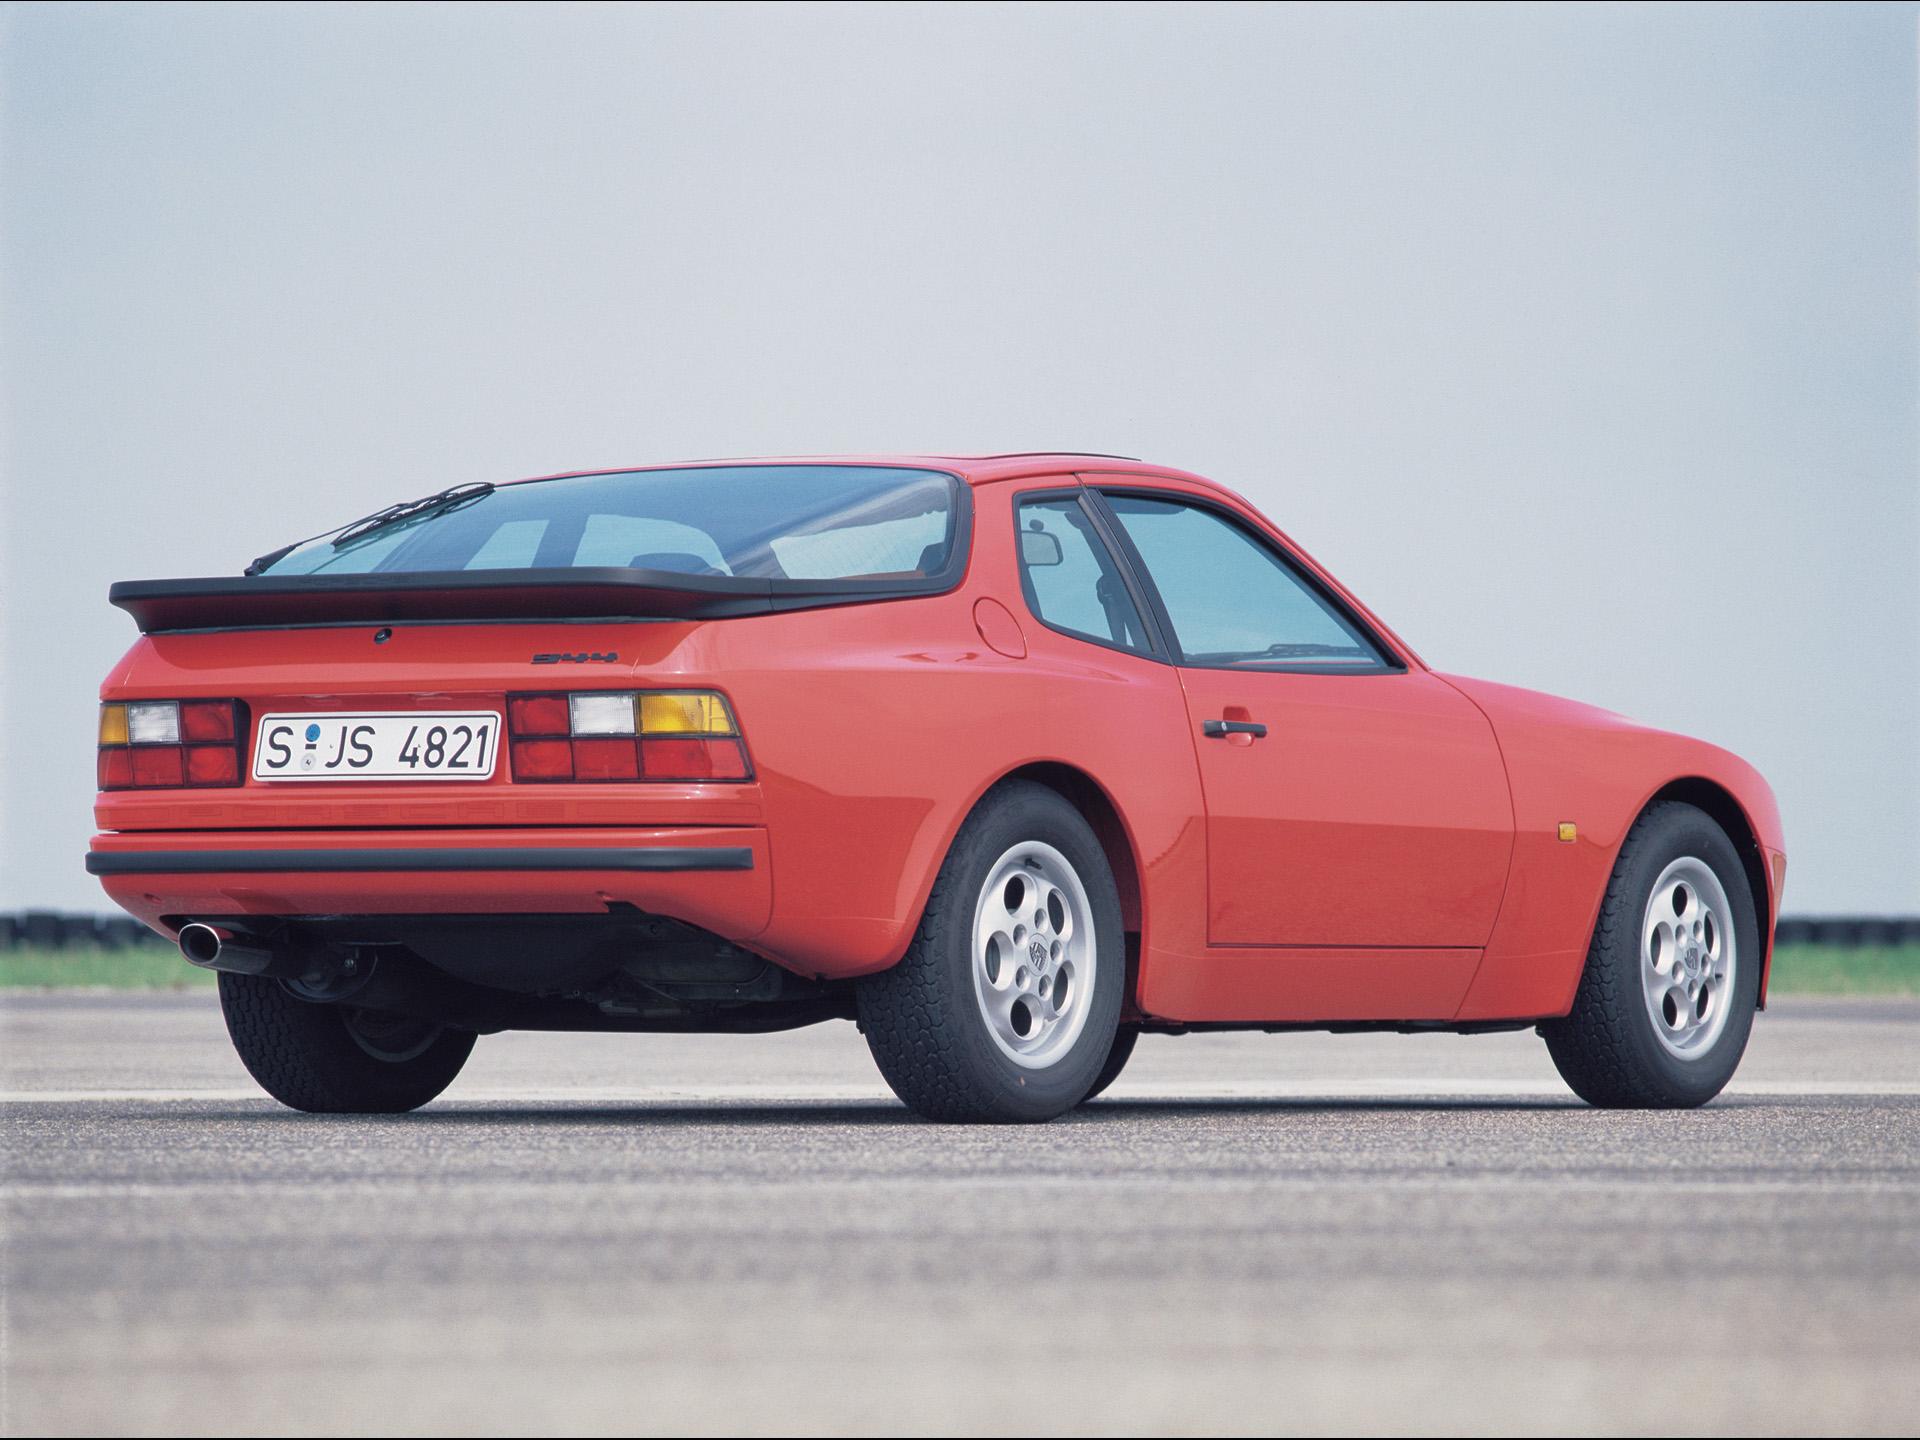 Porsche 944 1981 - 1991 Cabriolet #5